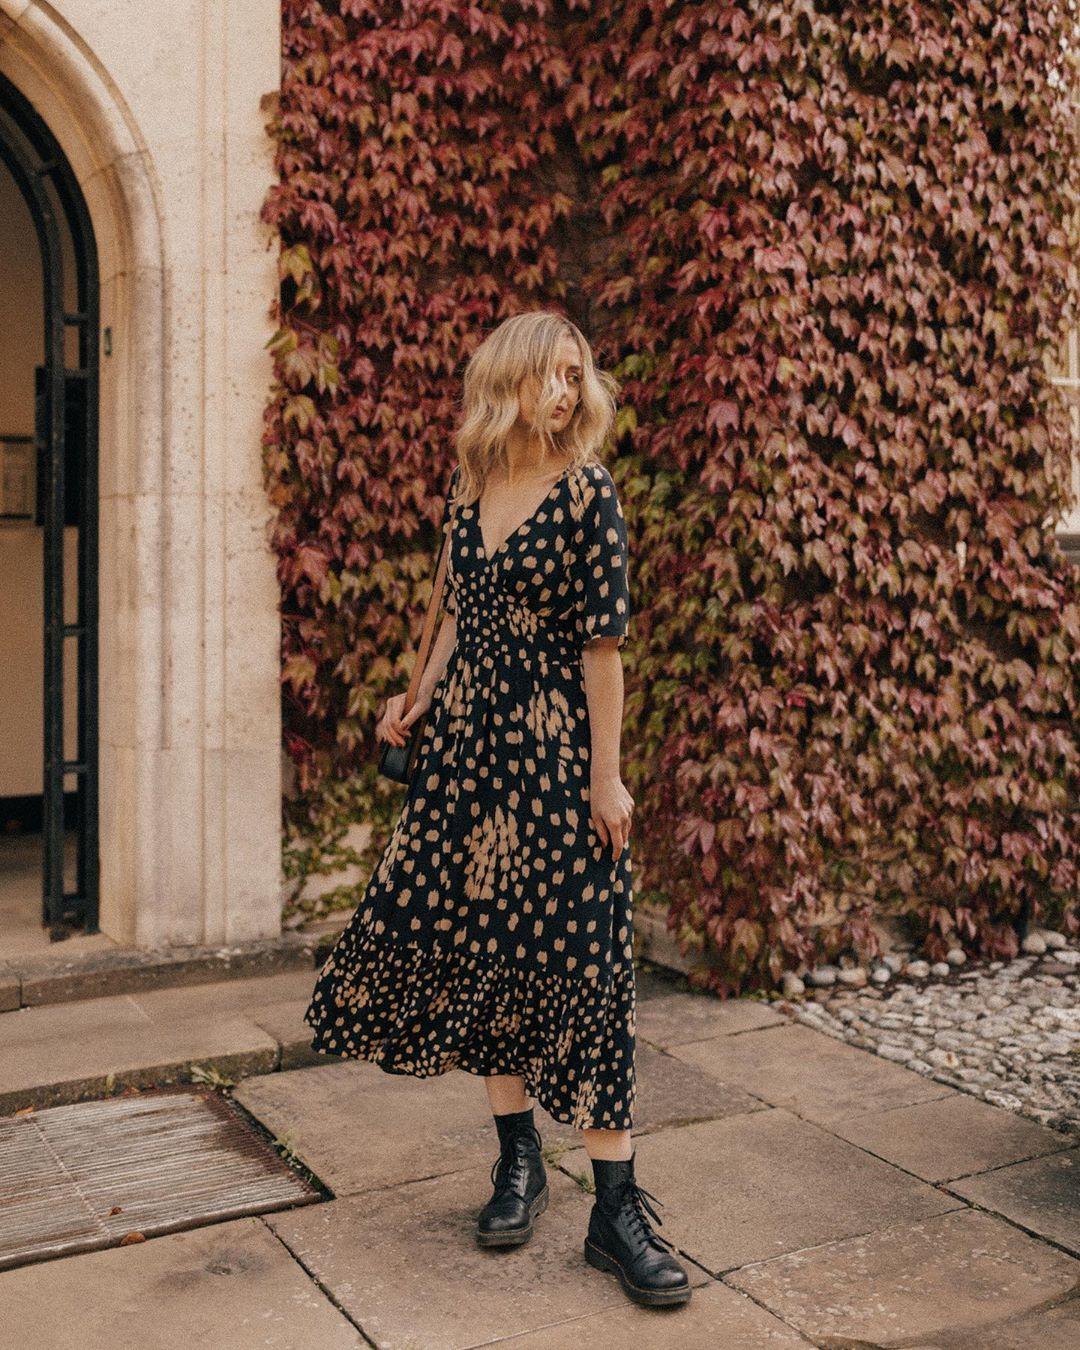 The (Mostly) Sustainable Autumn Capsule Wardrobe   crisp, romantic, beautiful wardrobe from sustainable brands   image source: @sarahmantelin